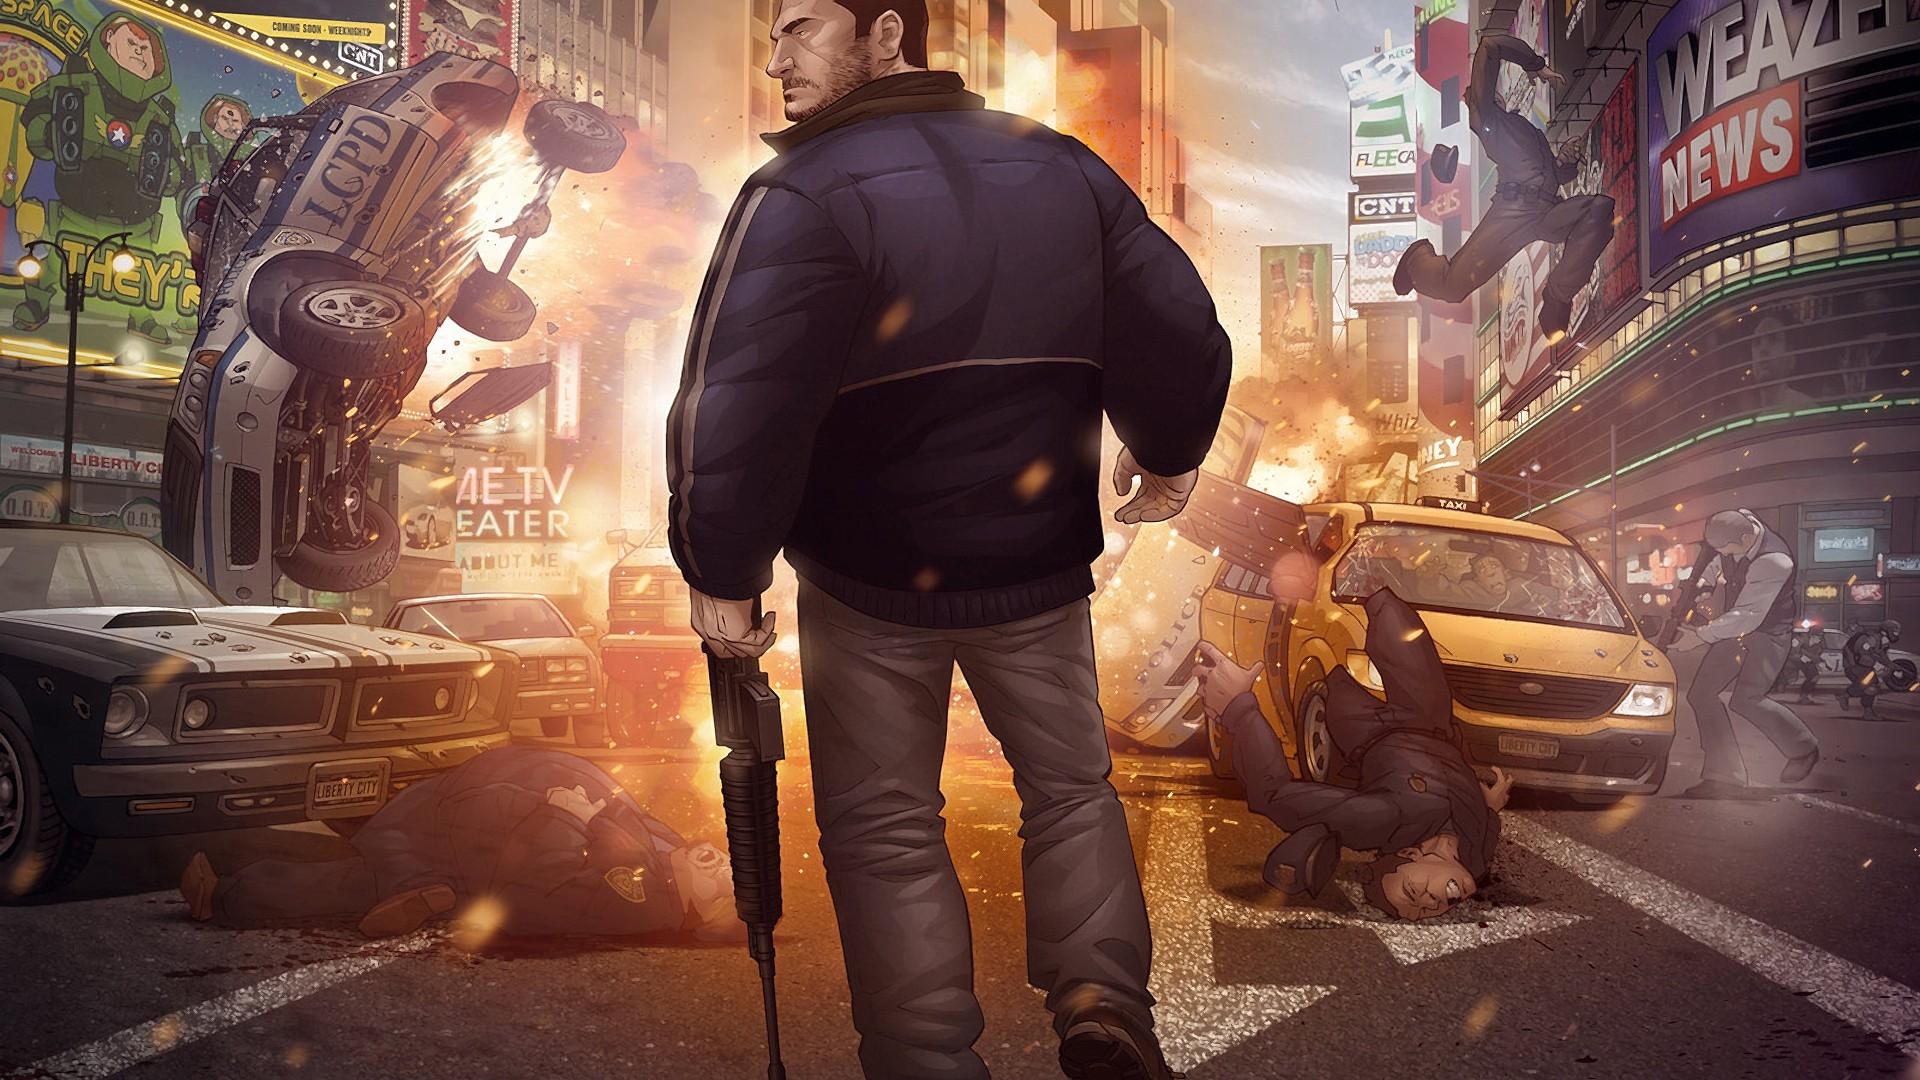 Fondos De Pantalla Gta Grand Theft Auto Imagen Arte De